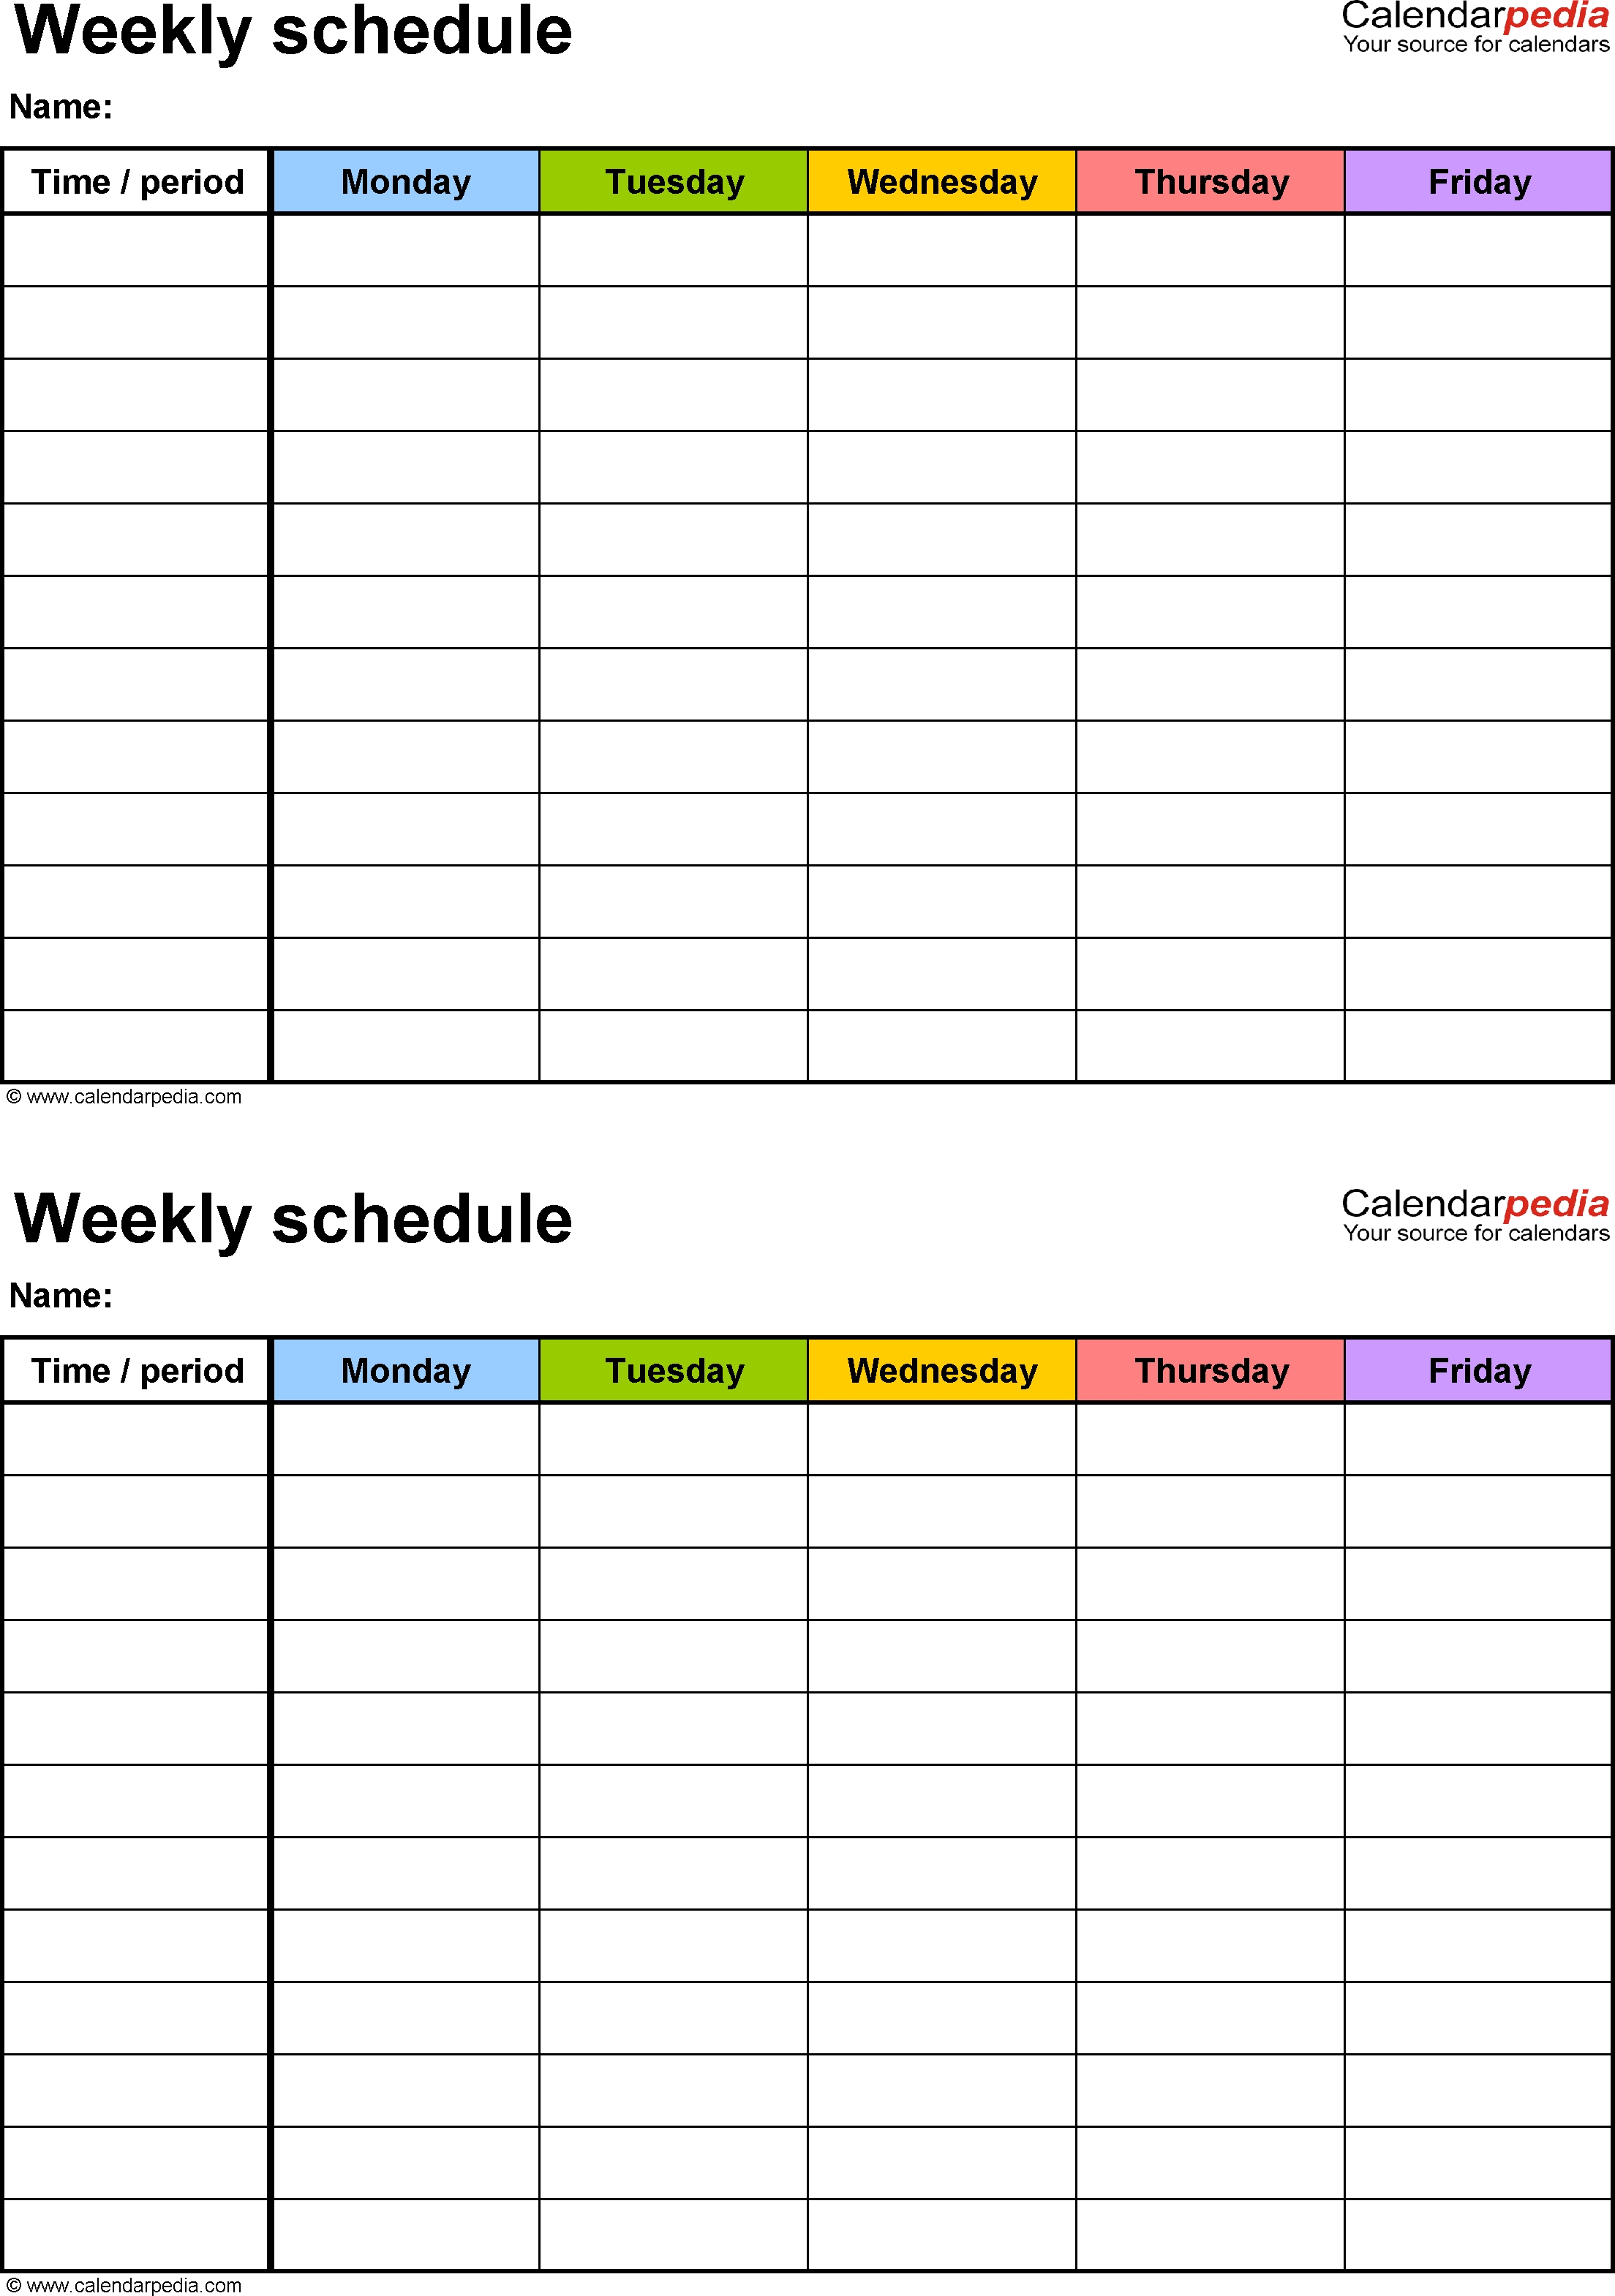 Free Weekly Schedule Templates For Word - 18 Templates 2 Week Calendar Template Printable